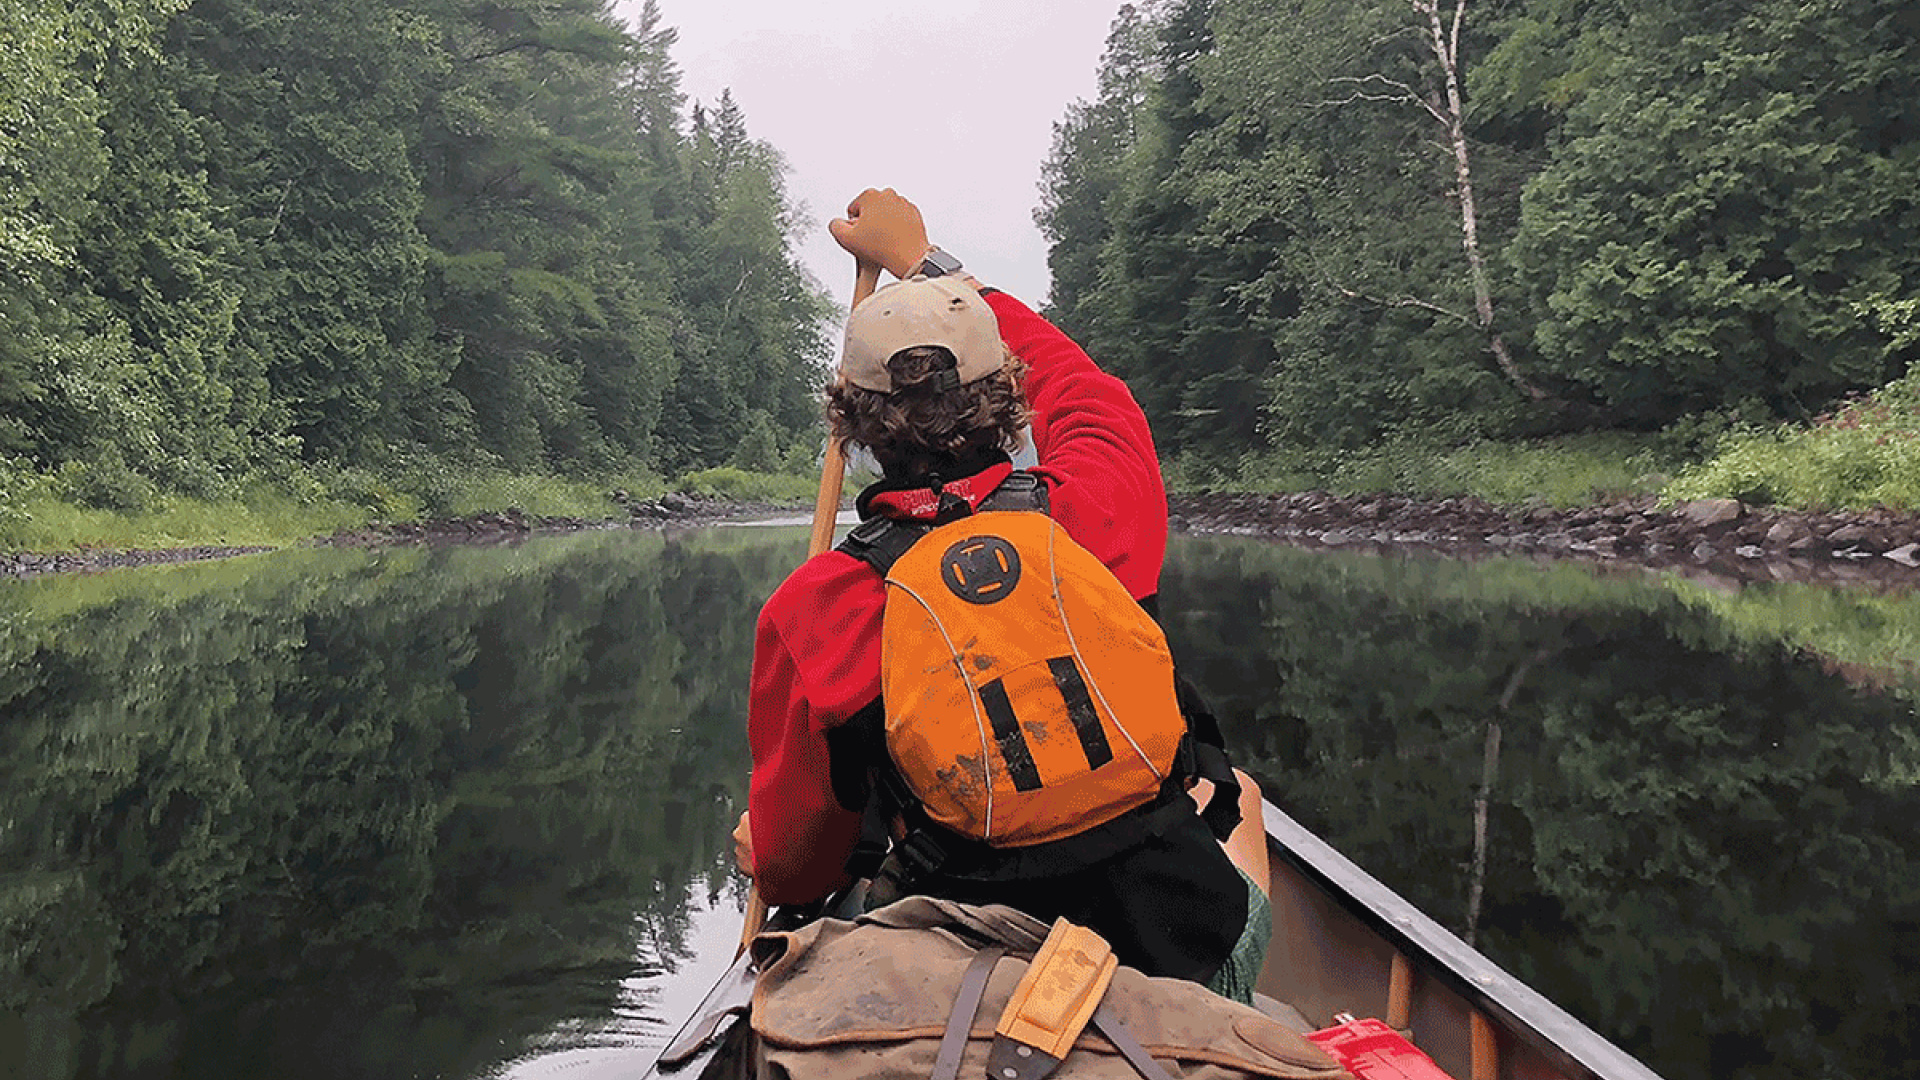 Explore Ontario's nature with MHO Adventures | Ontario canoe and portage trip